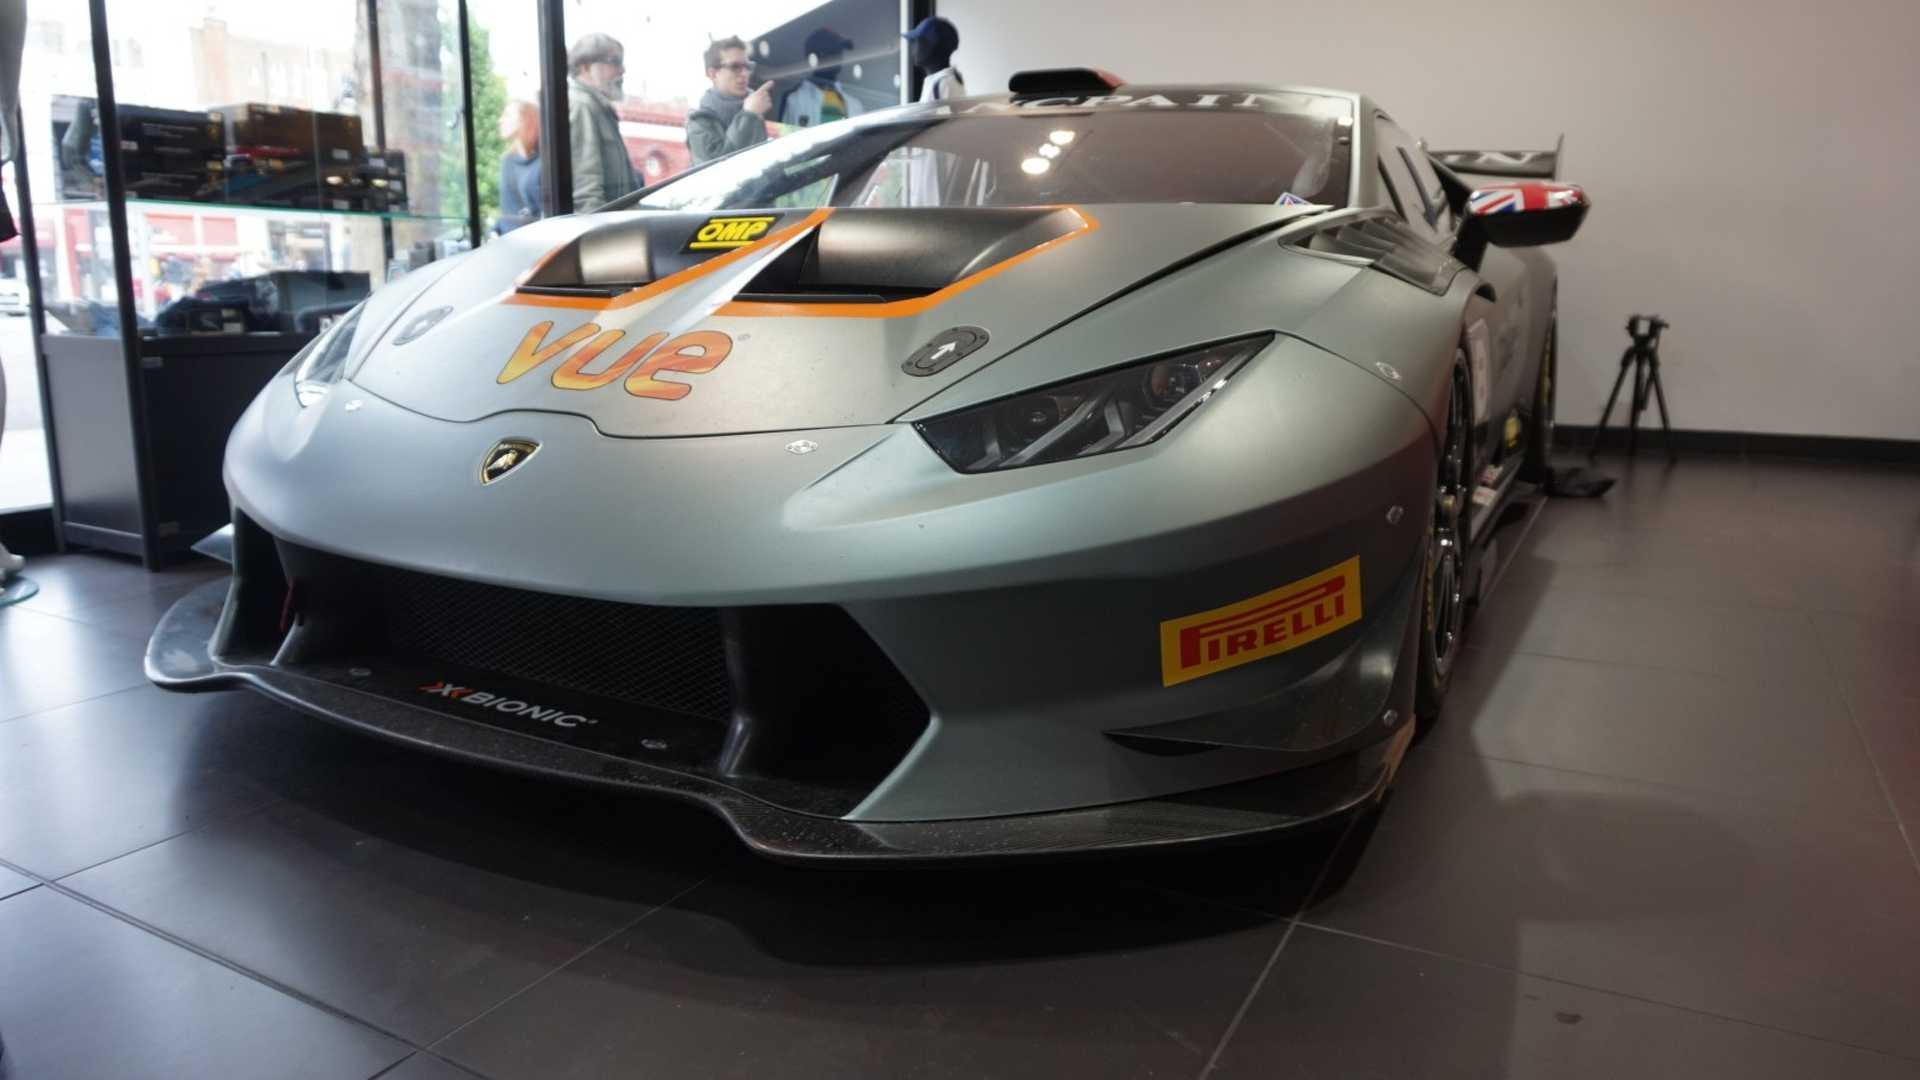 Racecarsdirect.com - 2016 Lamborghini Huracan Super Trofeo   2016 Lamborghini Huracan Super Trofeo